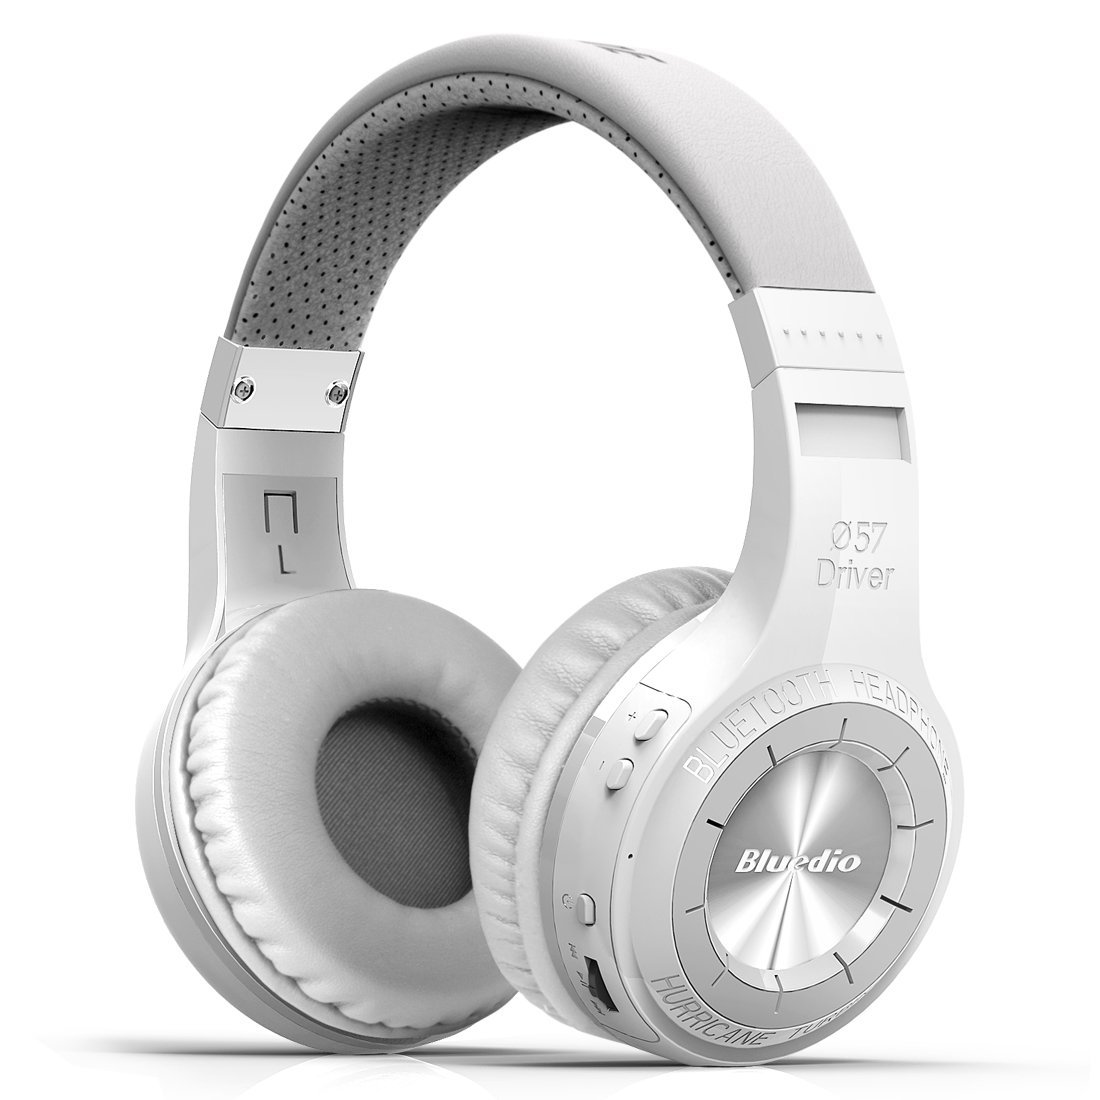 Bluedio H-Turbine Bluetooth Stereo Headphone 02